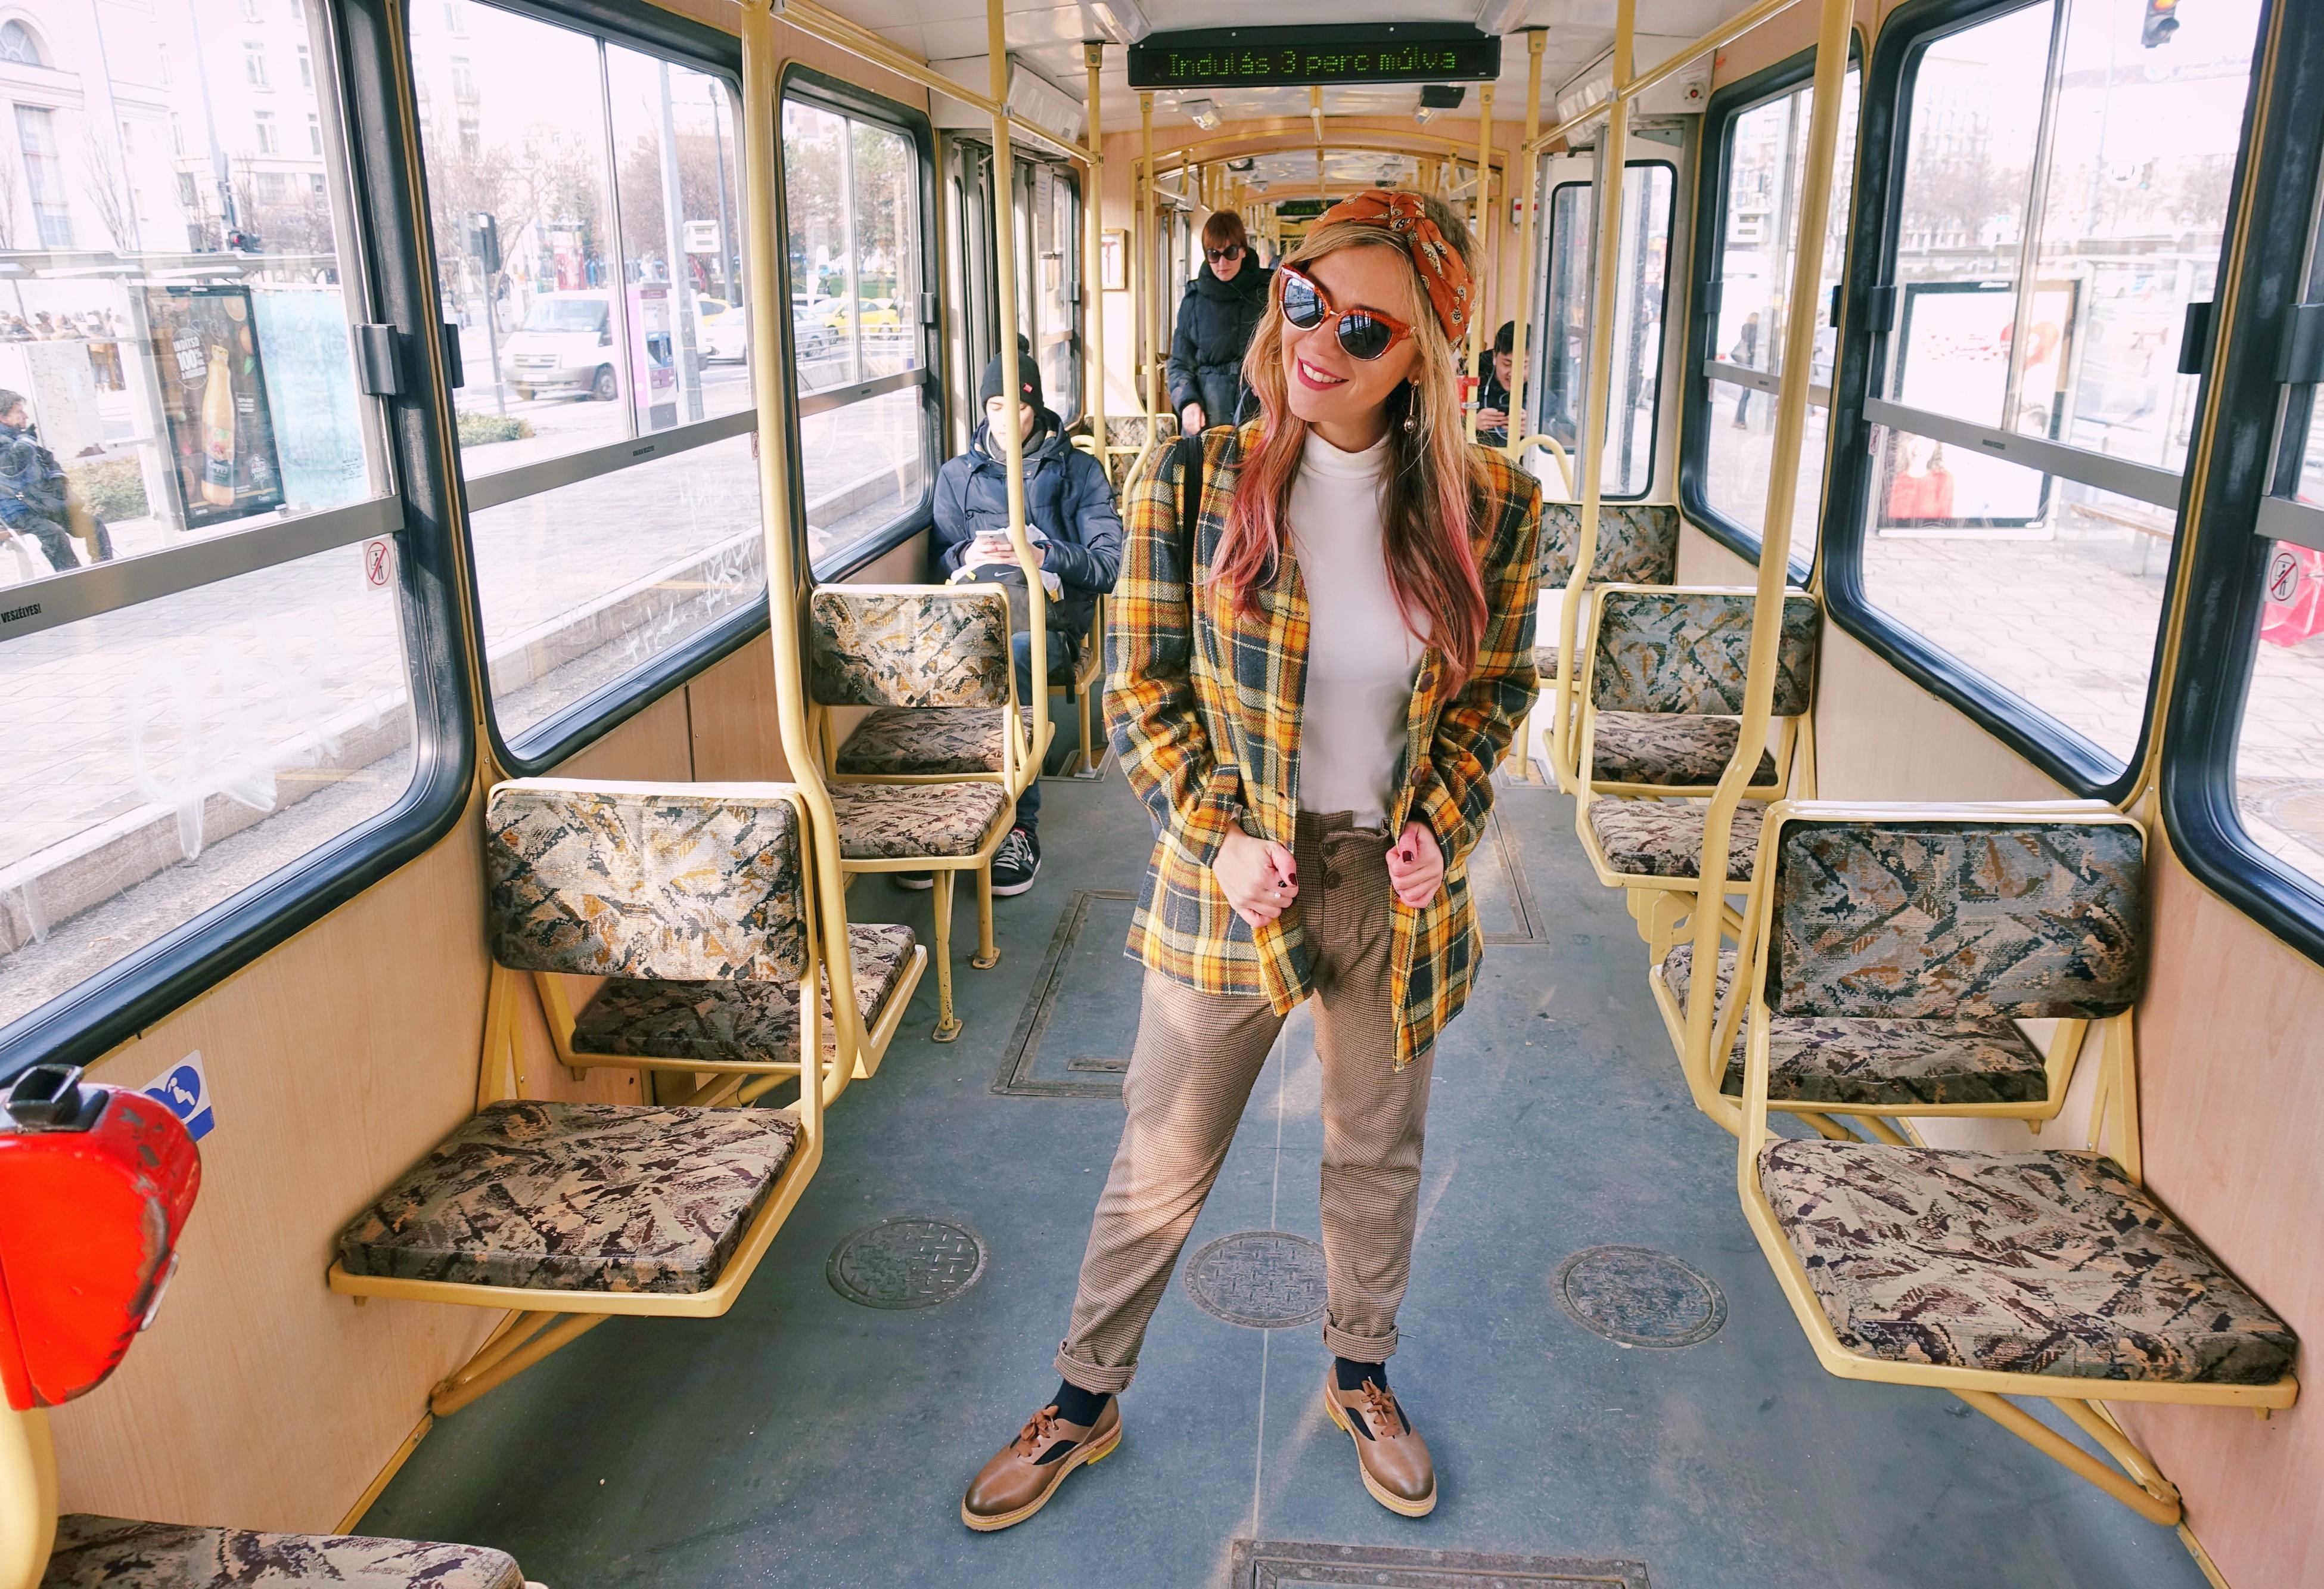 Fashionista-ChicAdicta-blog-de-moda-tranvia-de-budapest-blazer-de-cuadros-Chic-Adicta-influencer-zapatos-neosens-PiensaenChic-Piensa-en-Chic